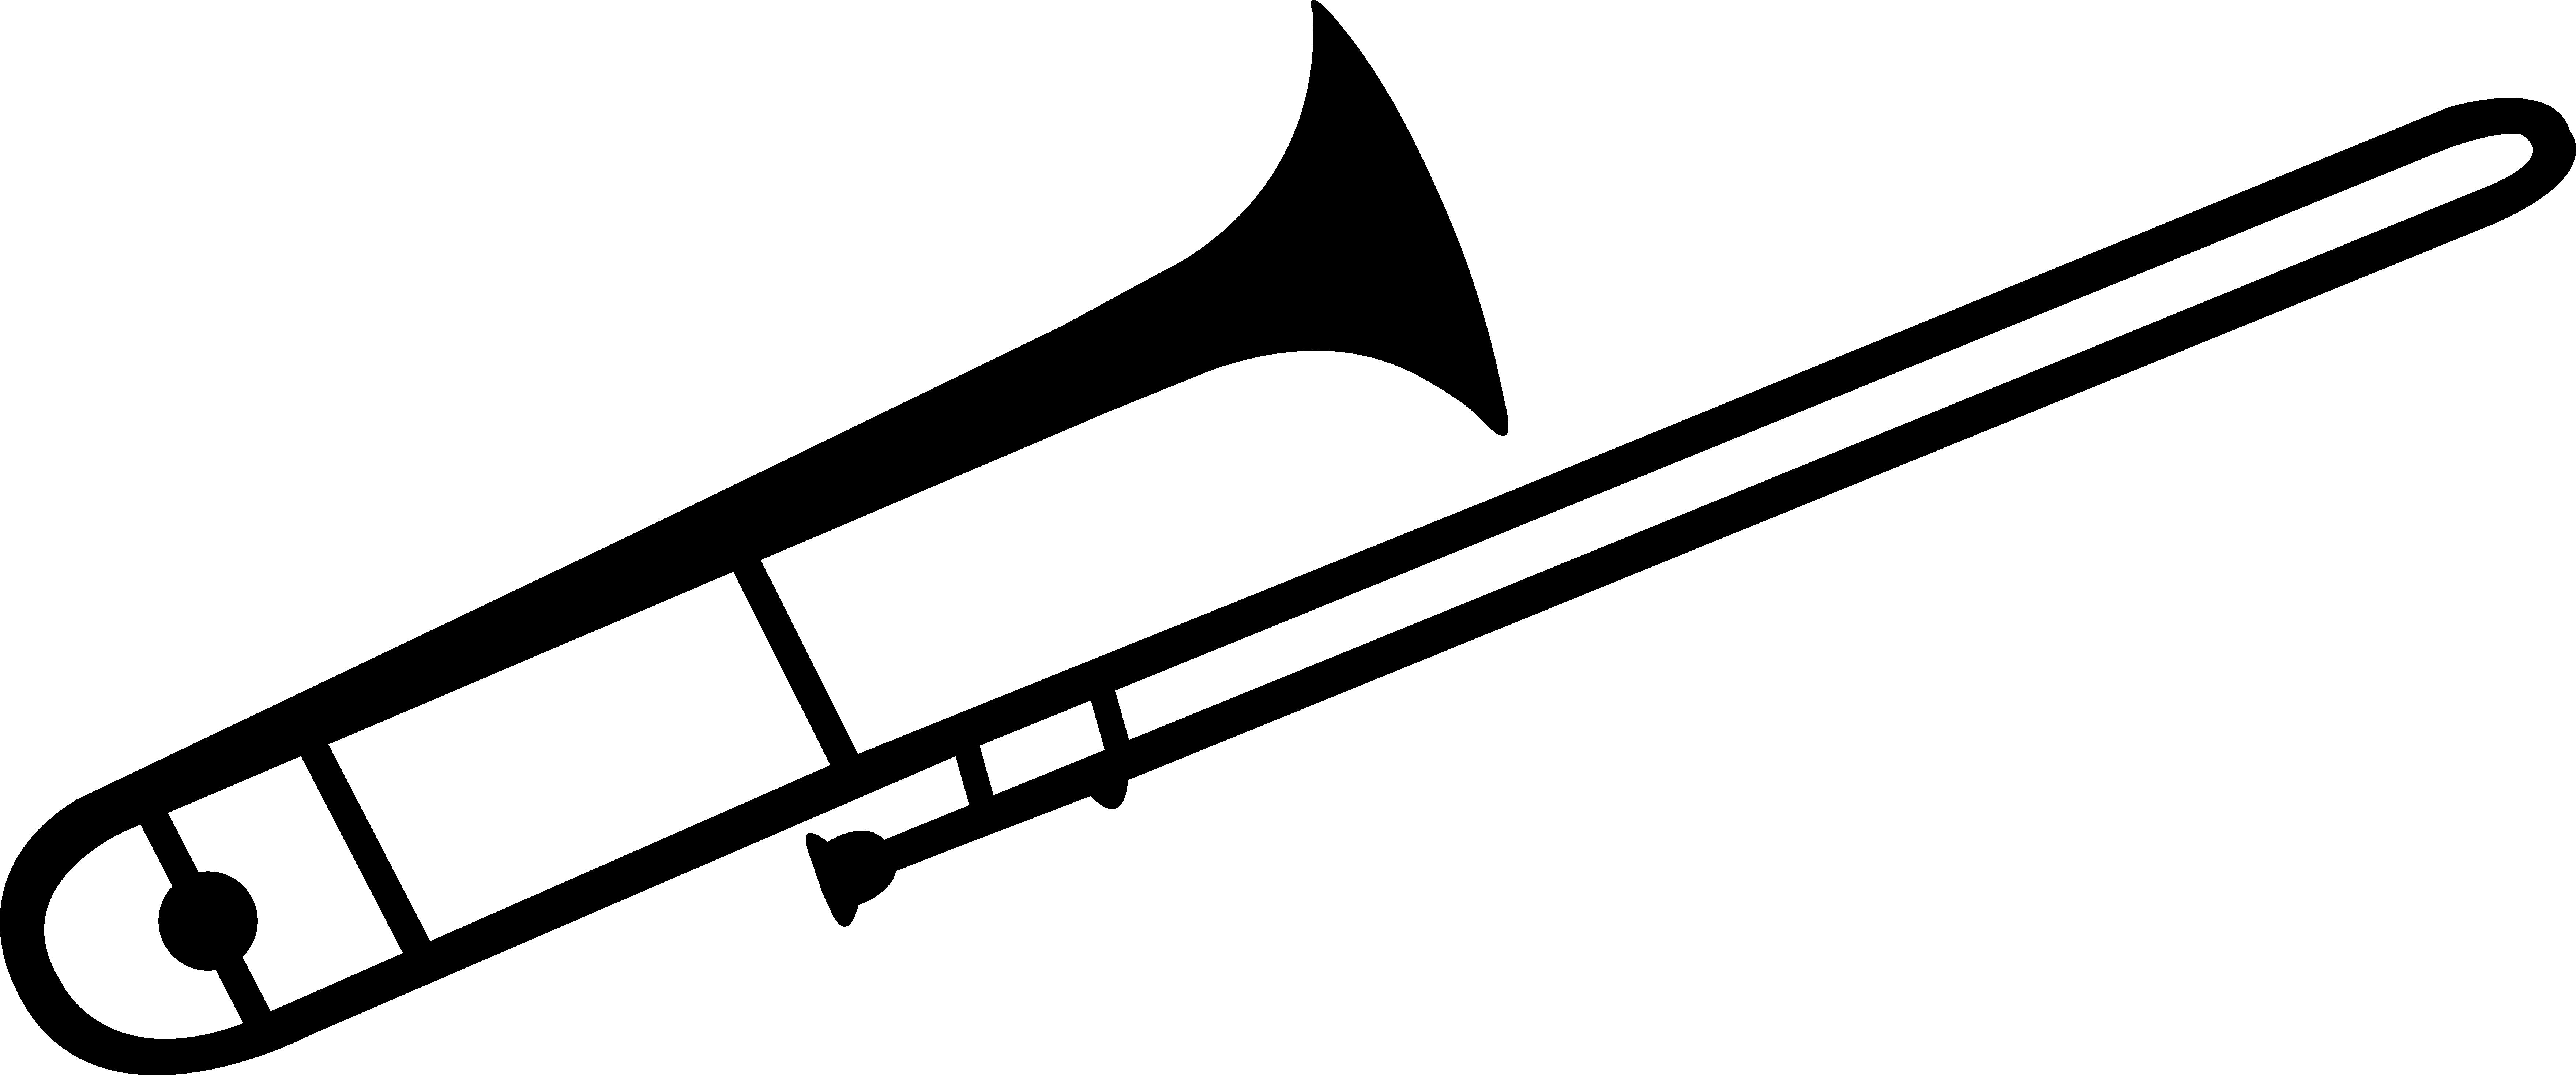 Flutes clipart silhouette. Quad drum clip art